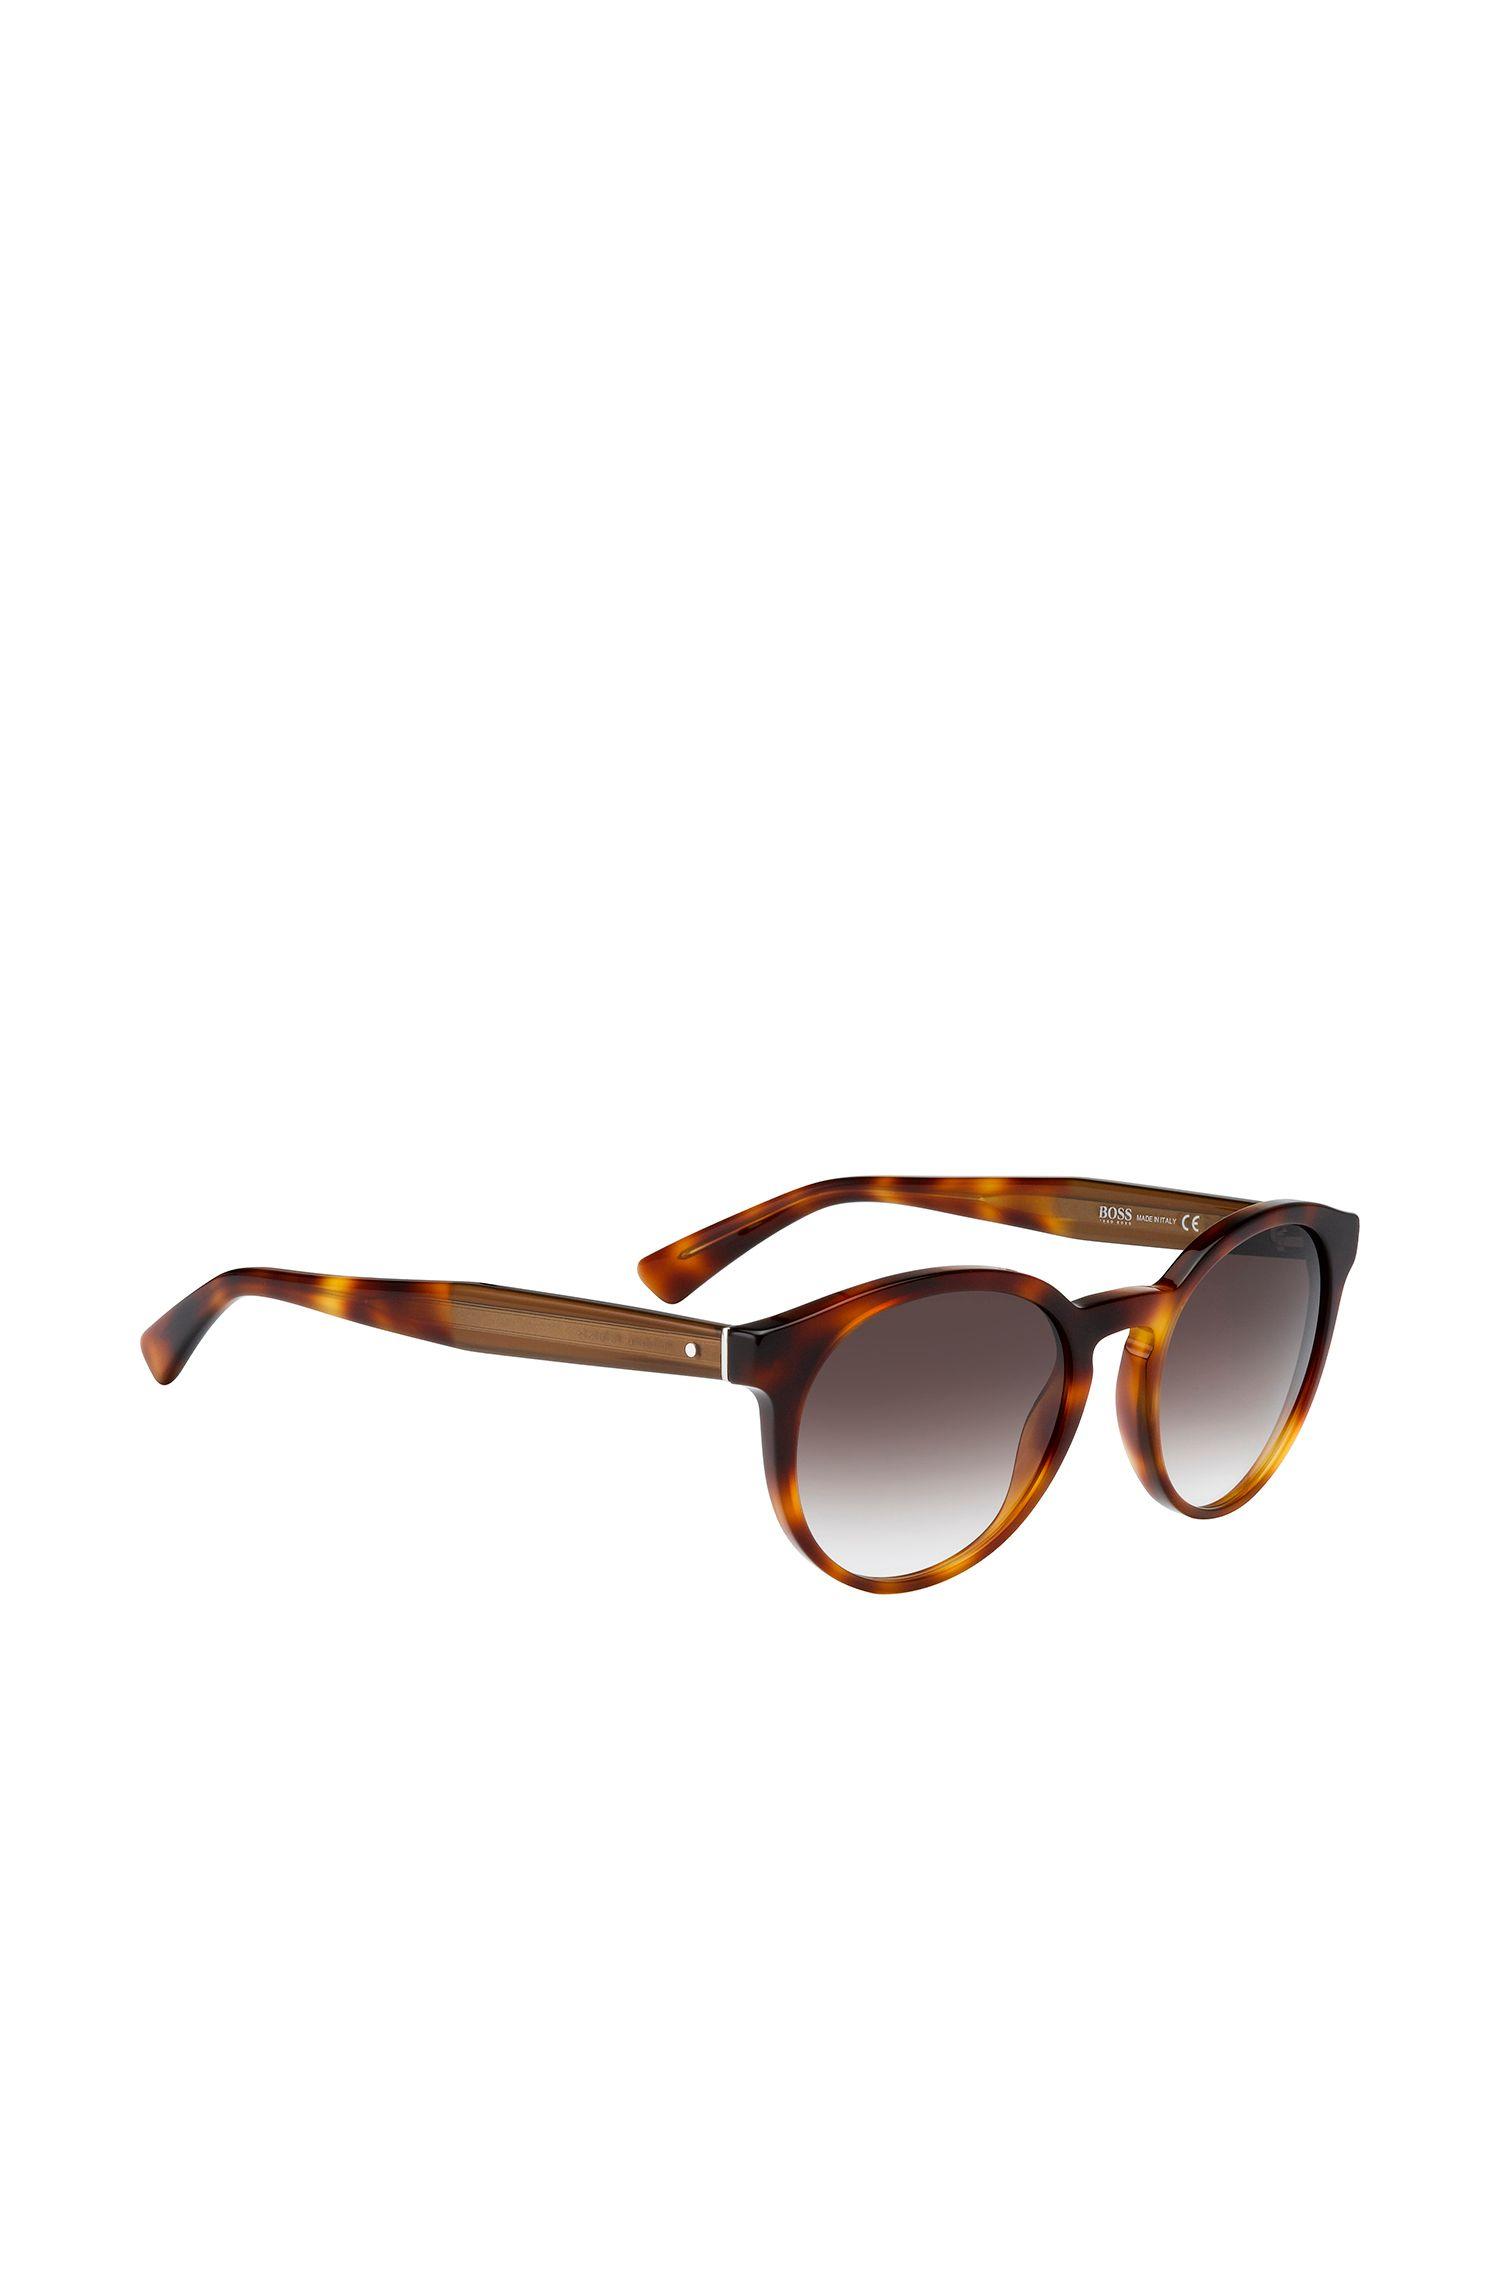 Bruine zonnebril in pantostijl: 'BOSS 0794/S'